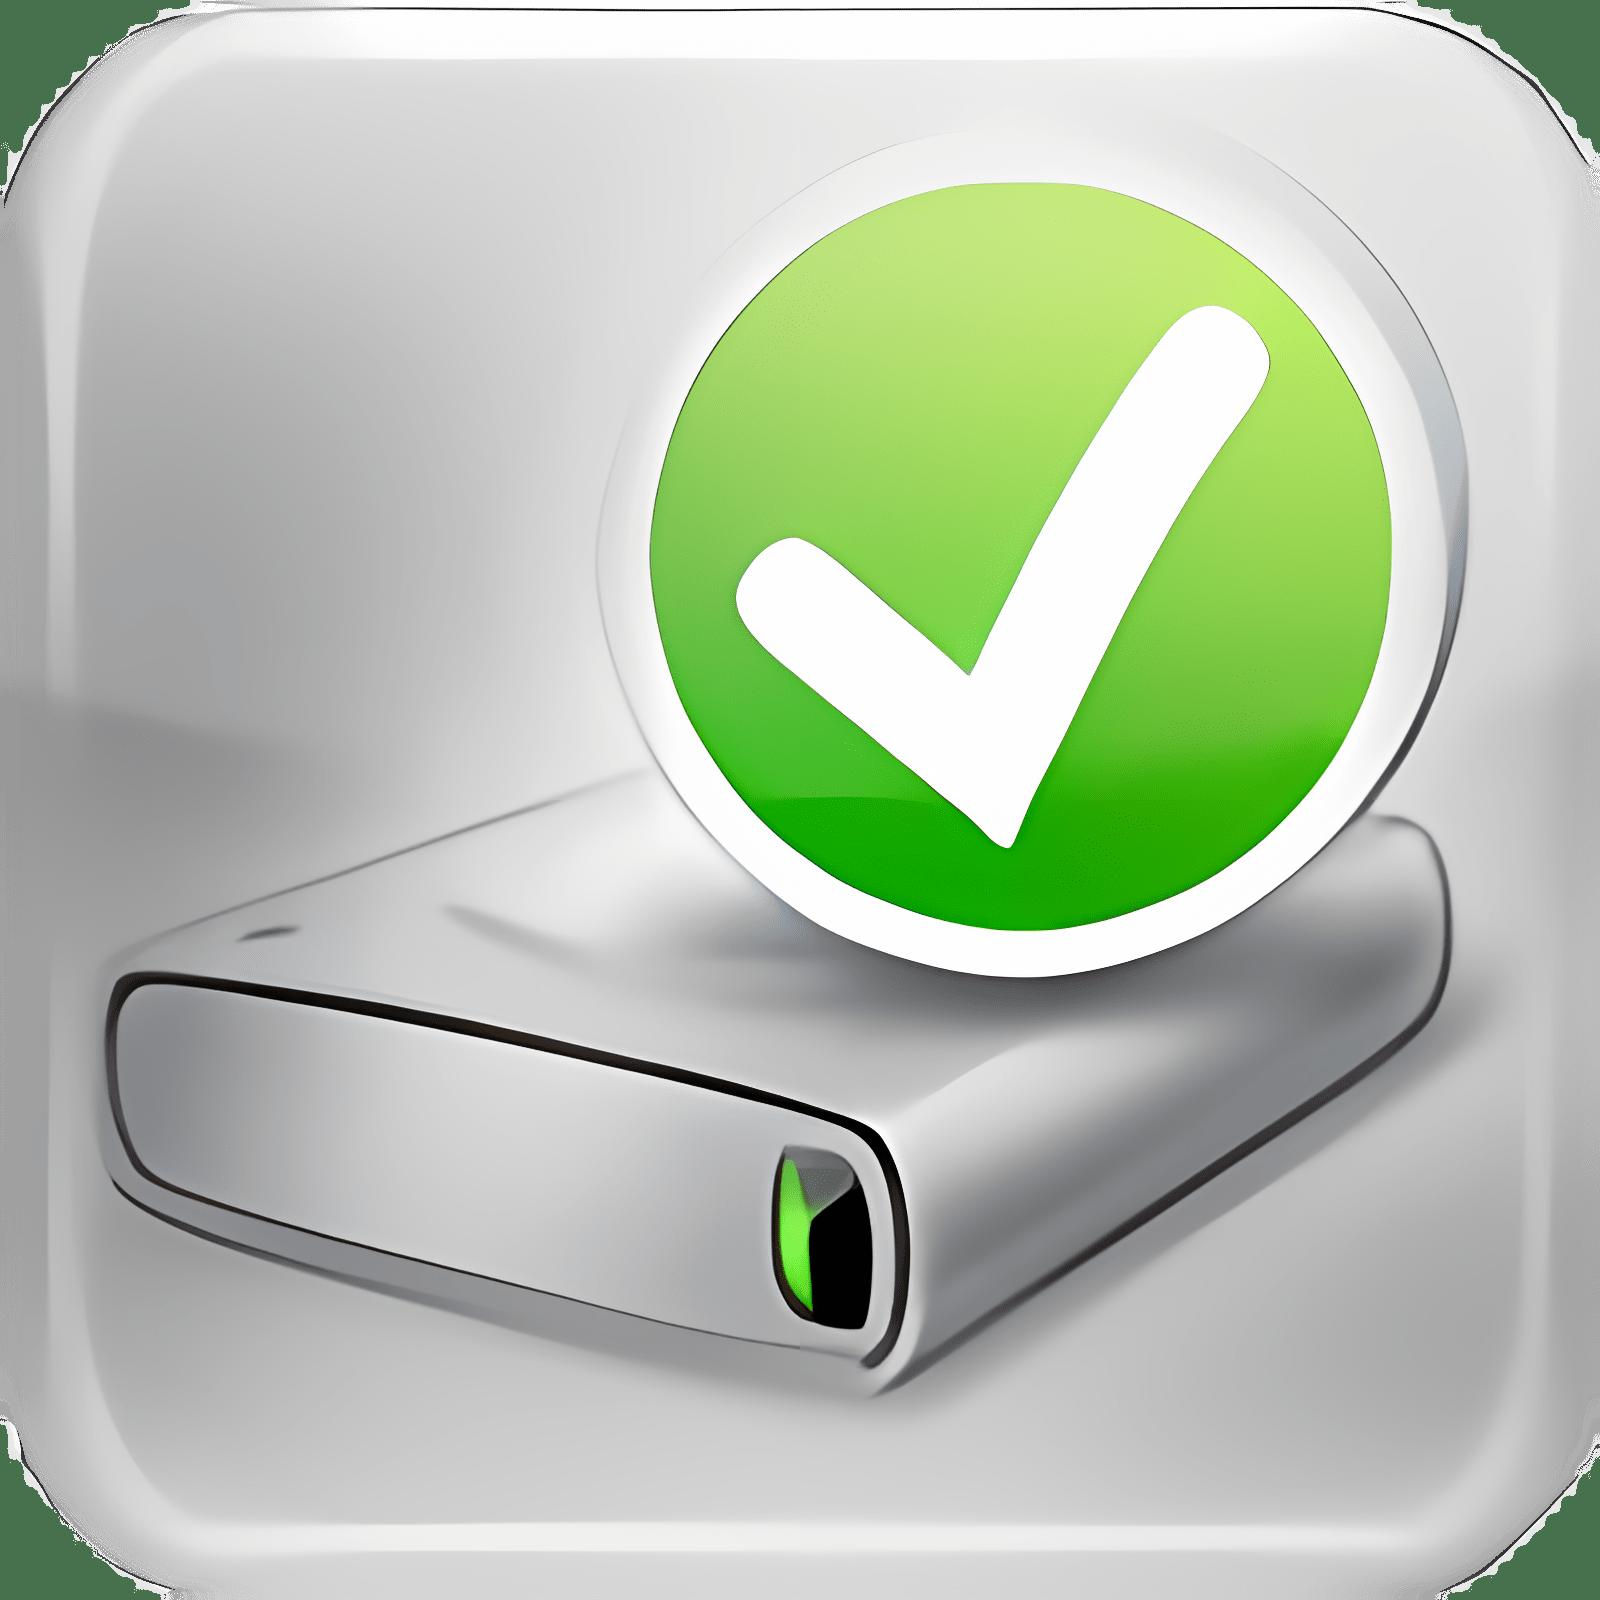 WinUtilities Free Disk Defragmenter